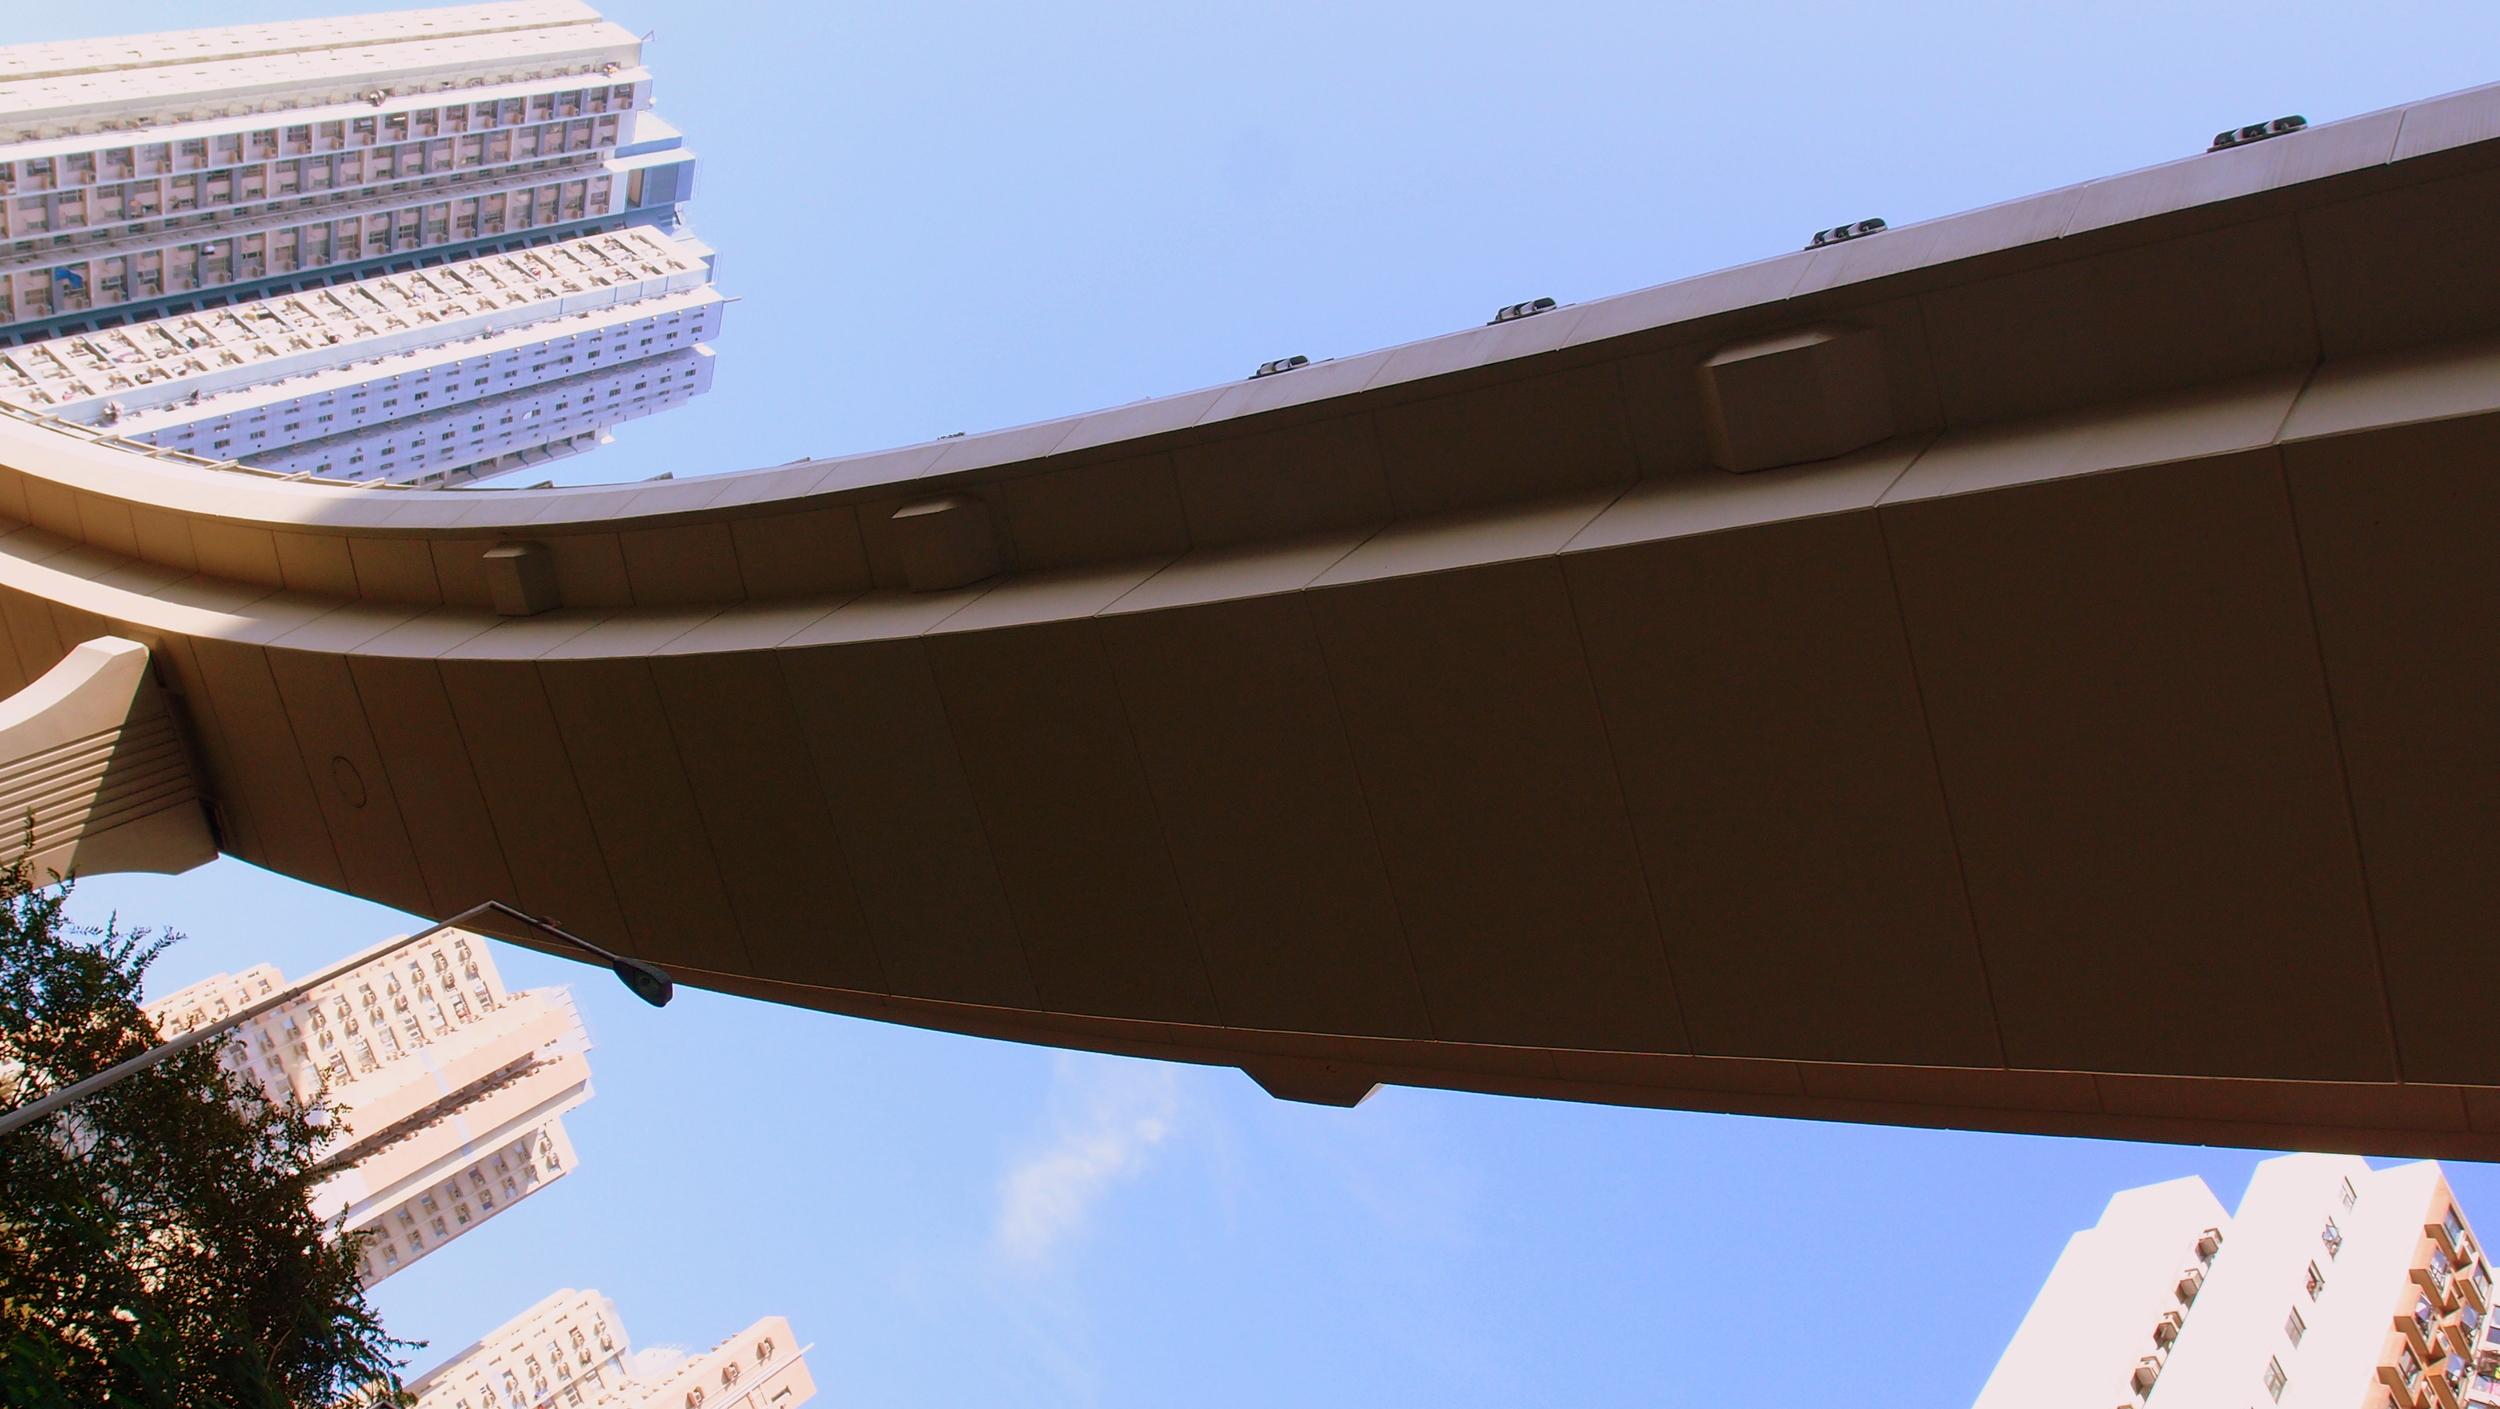 A flyover in Shau Kei Wan at the eastern end of Hong Kong Island